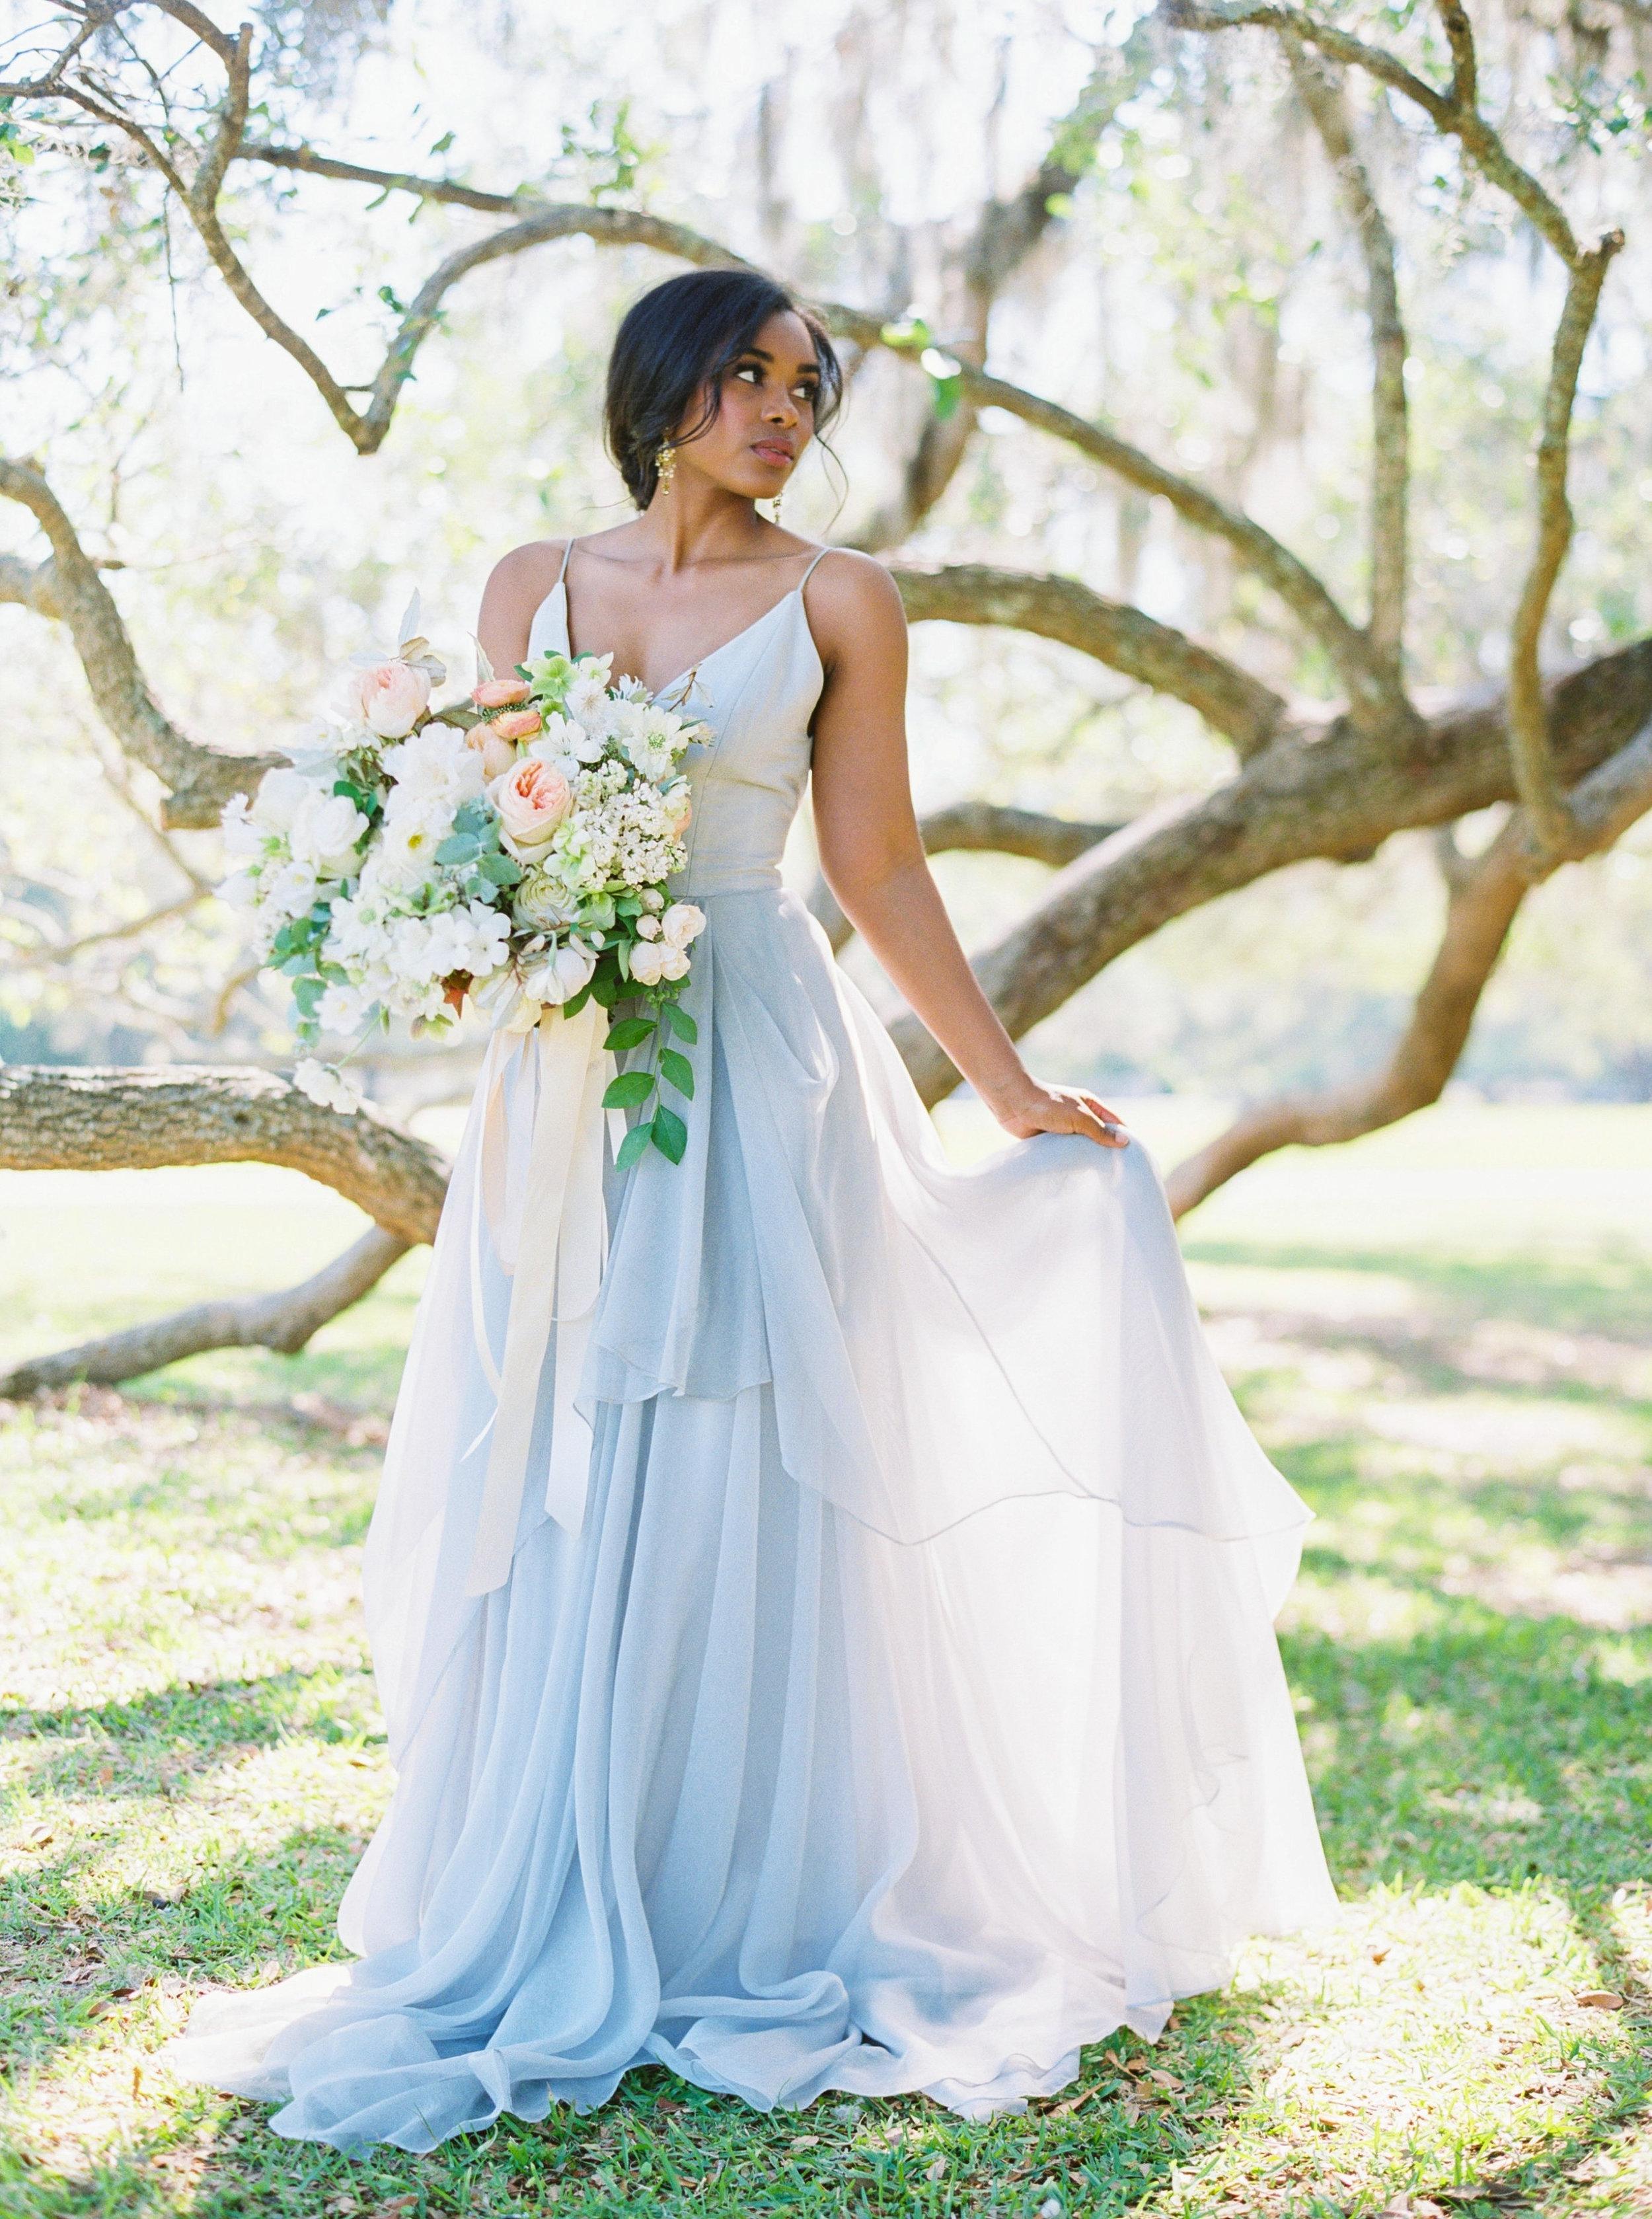 Charleston_Retreat_Kati_Rosado_Fine_Art_Film_Wedding_Photographer-127.jpg